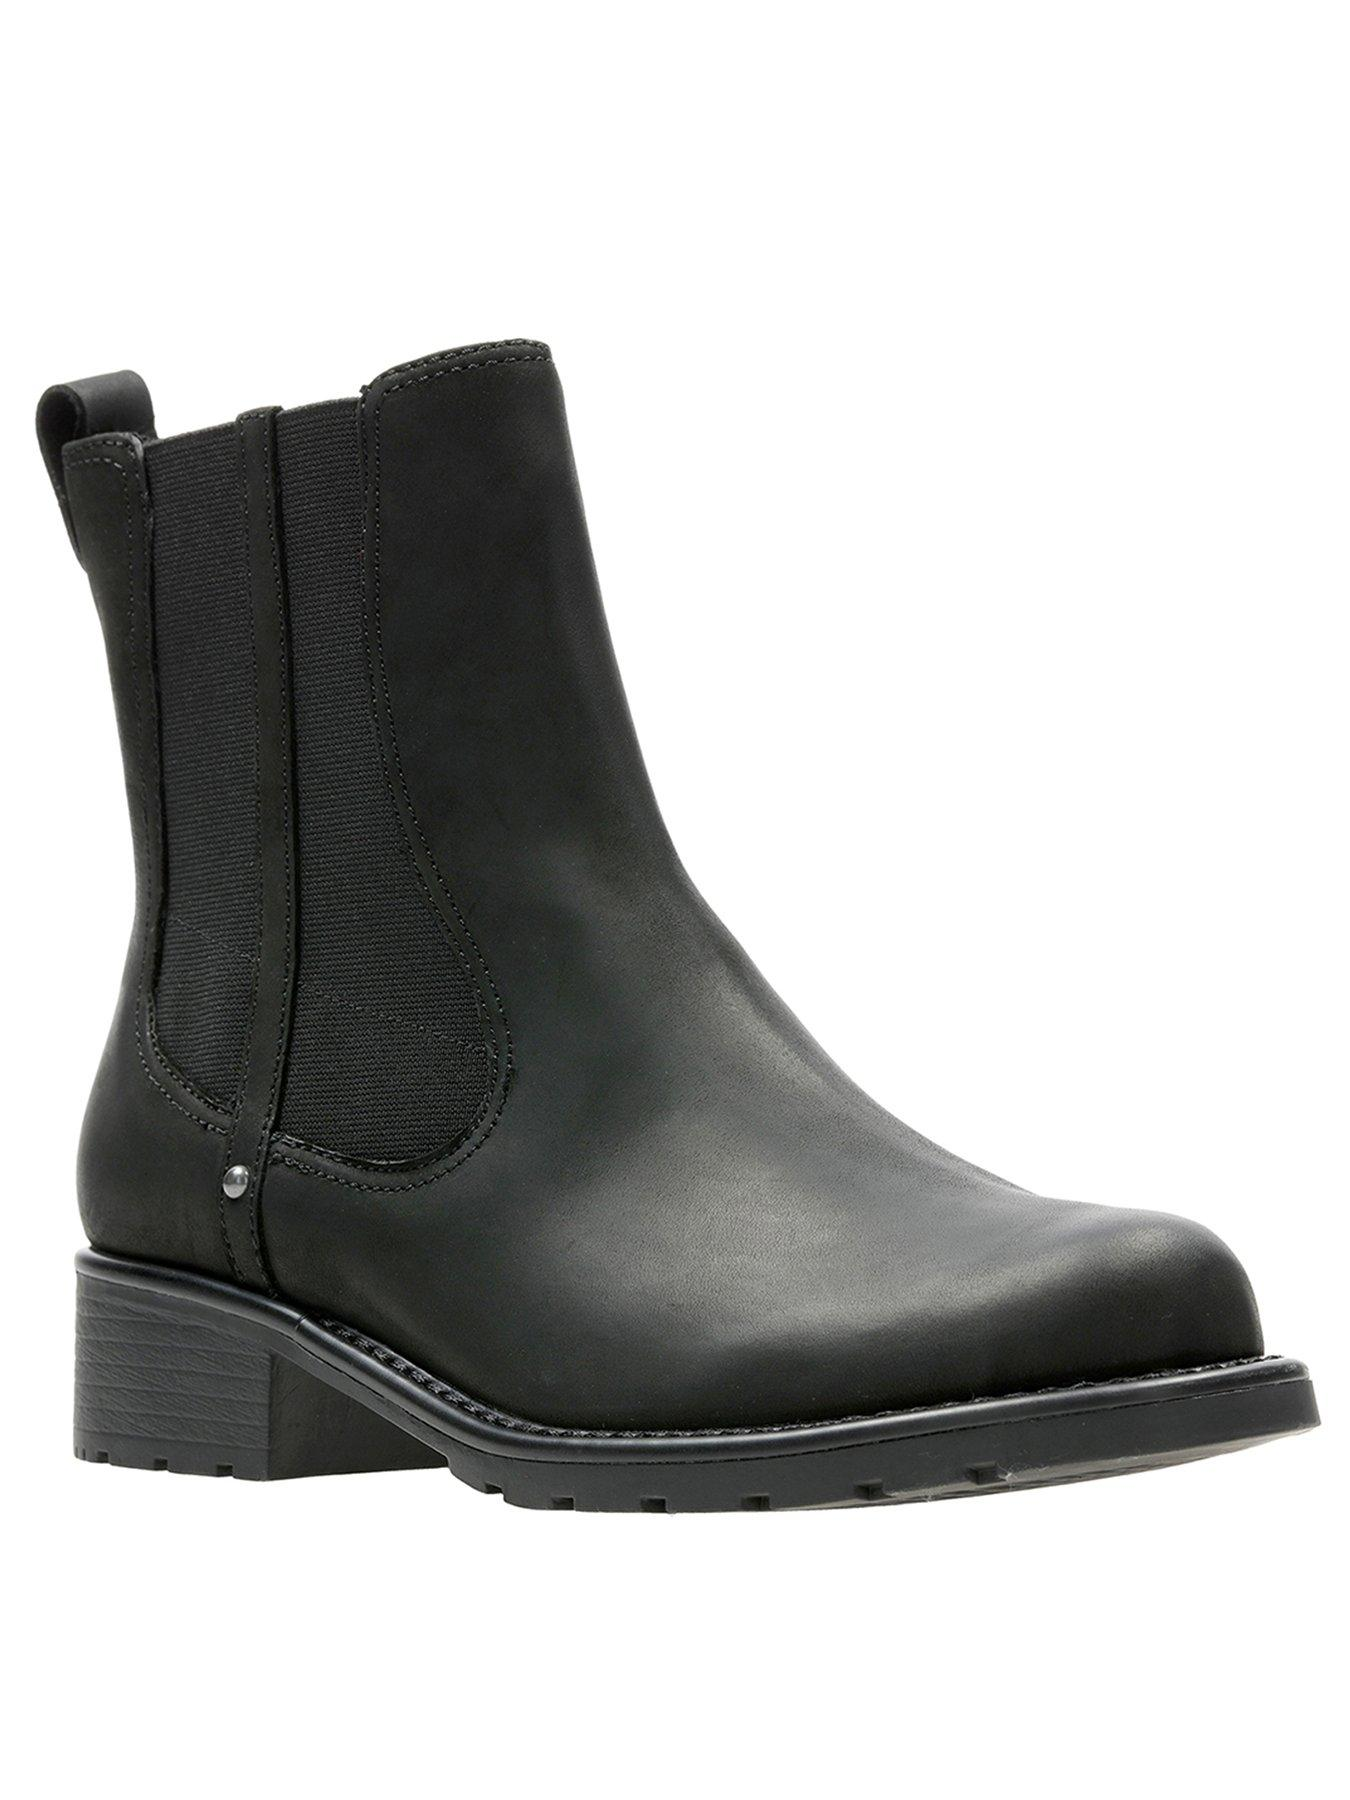 Cute Clarks Ellis Franklin Mens Chelsea Boots | DigiBless